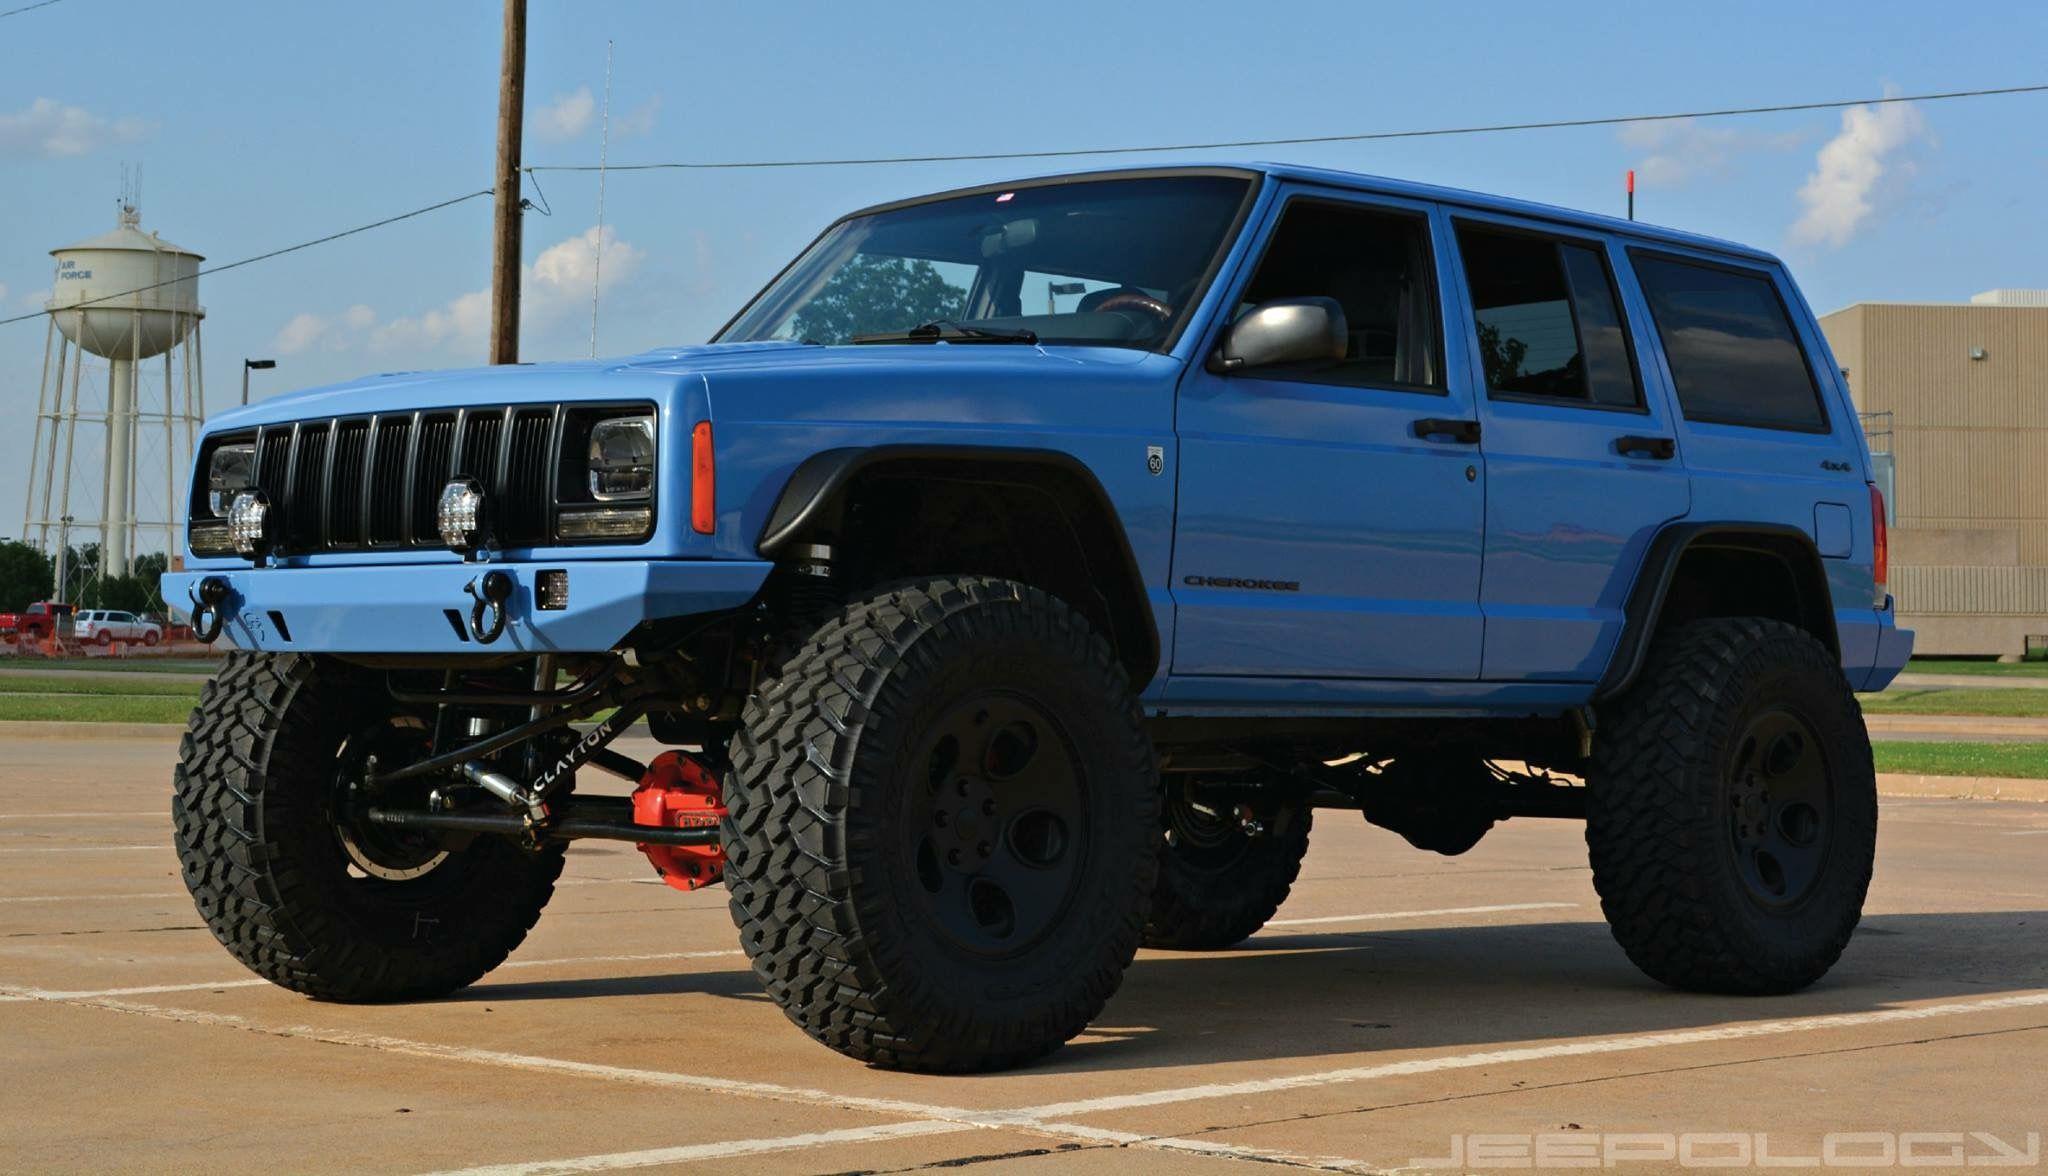 OO jeep xj Jeep cherokee, Jeep cherokee sport